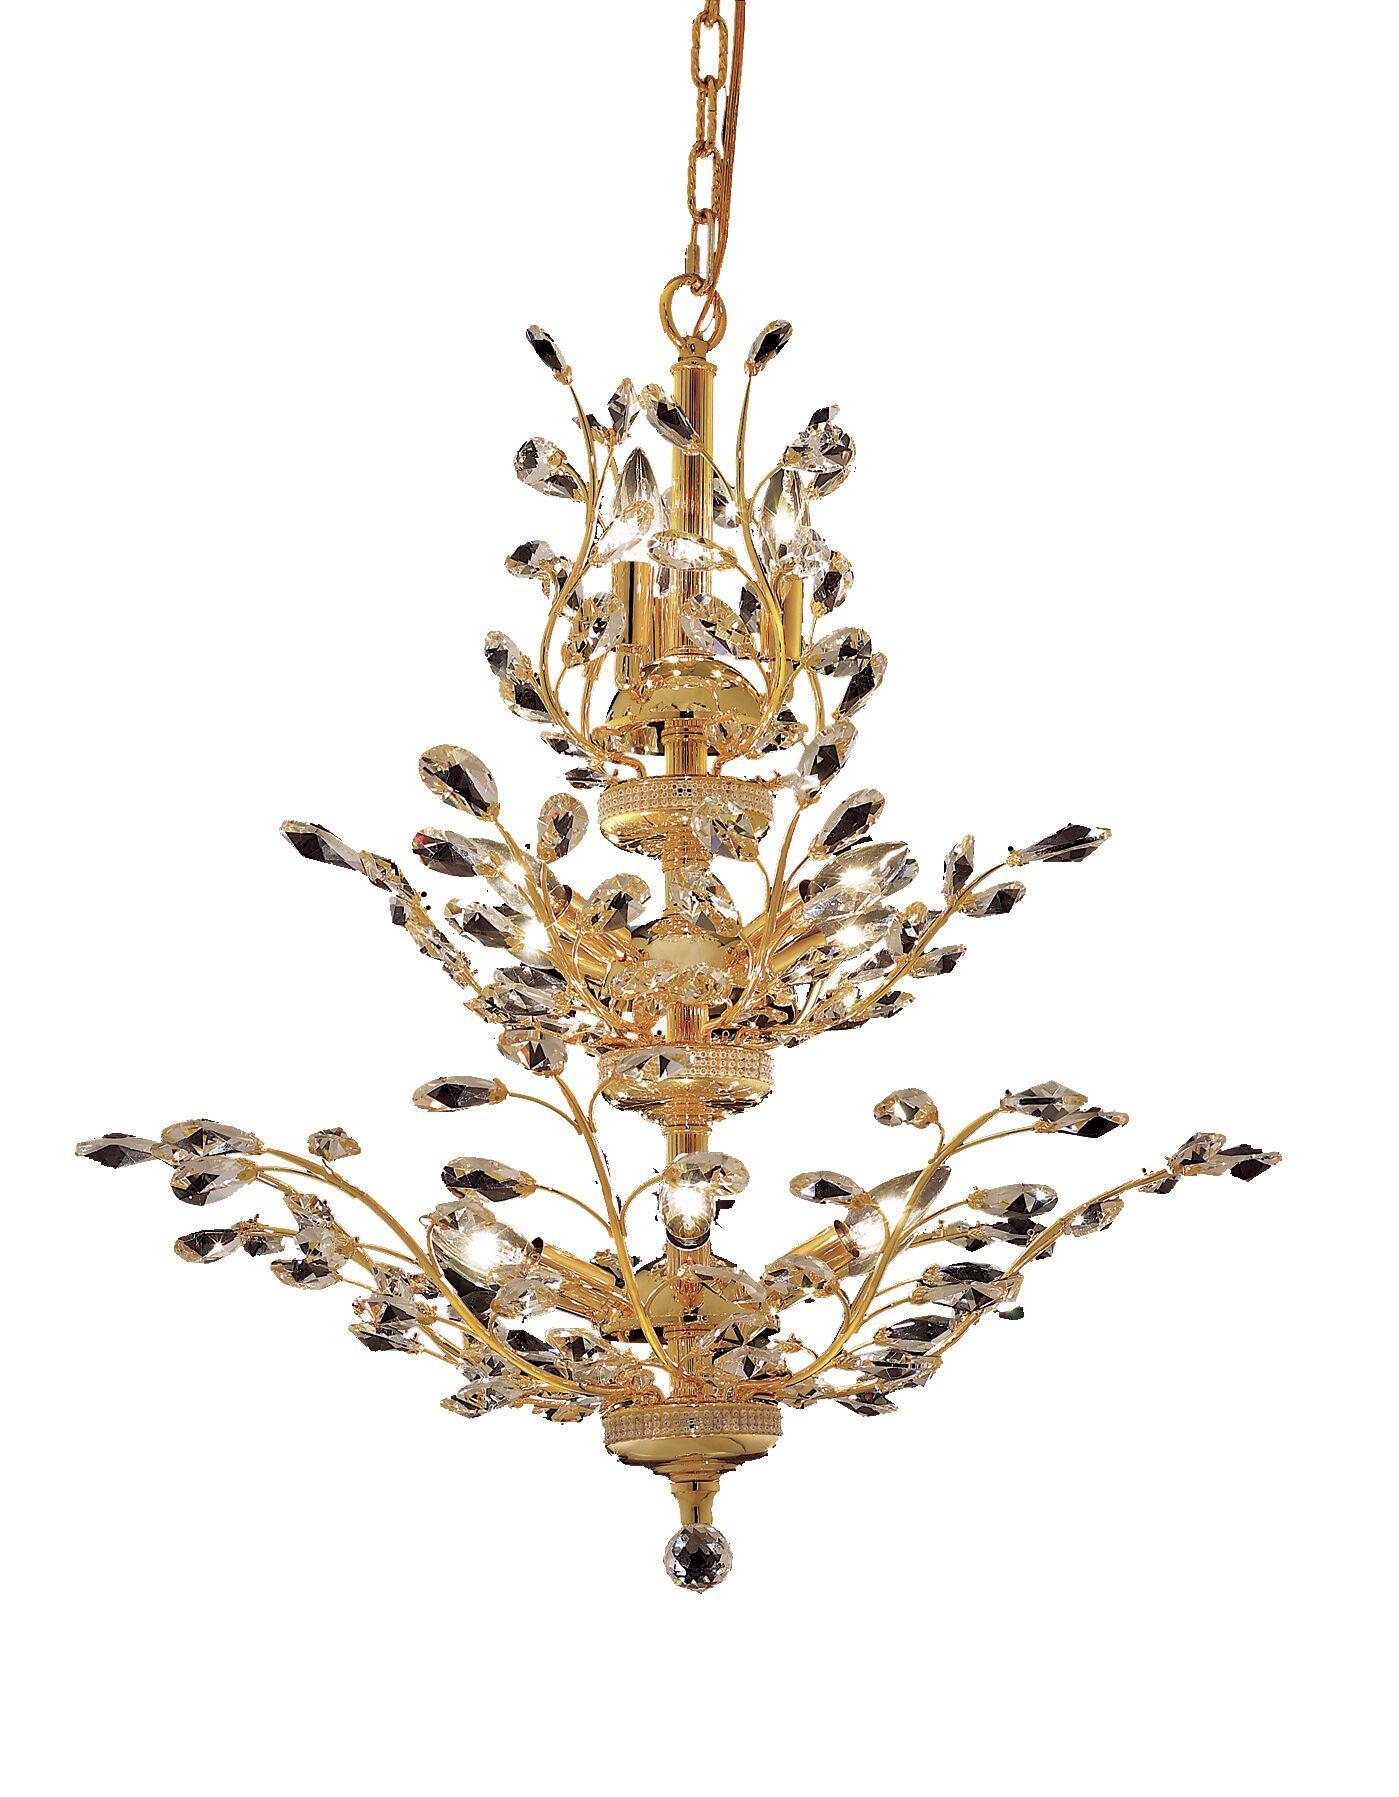 Lamons 13-Light Candle Style Chandelier Finish: Gold, Crystal Grade: Swarovski Strass